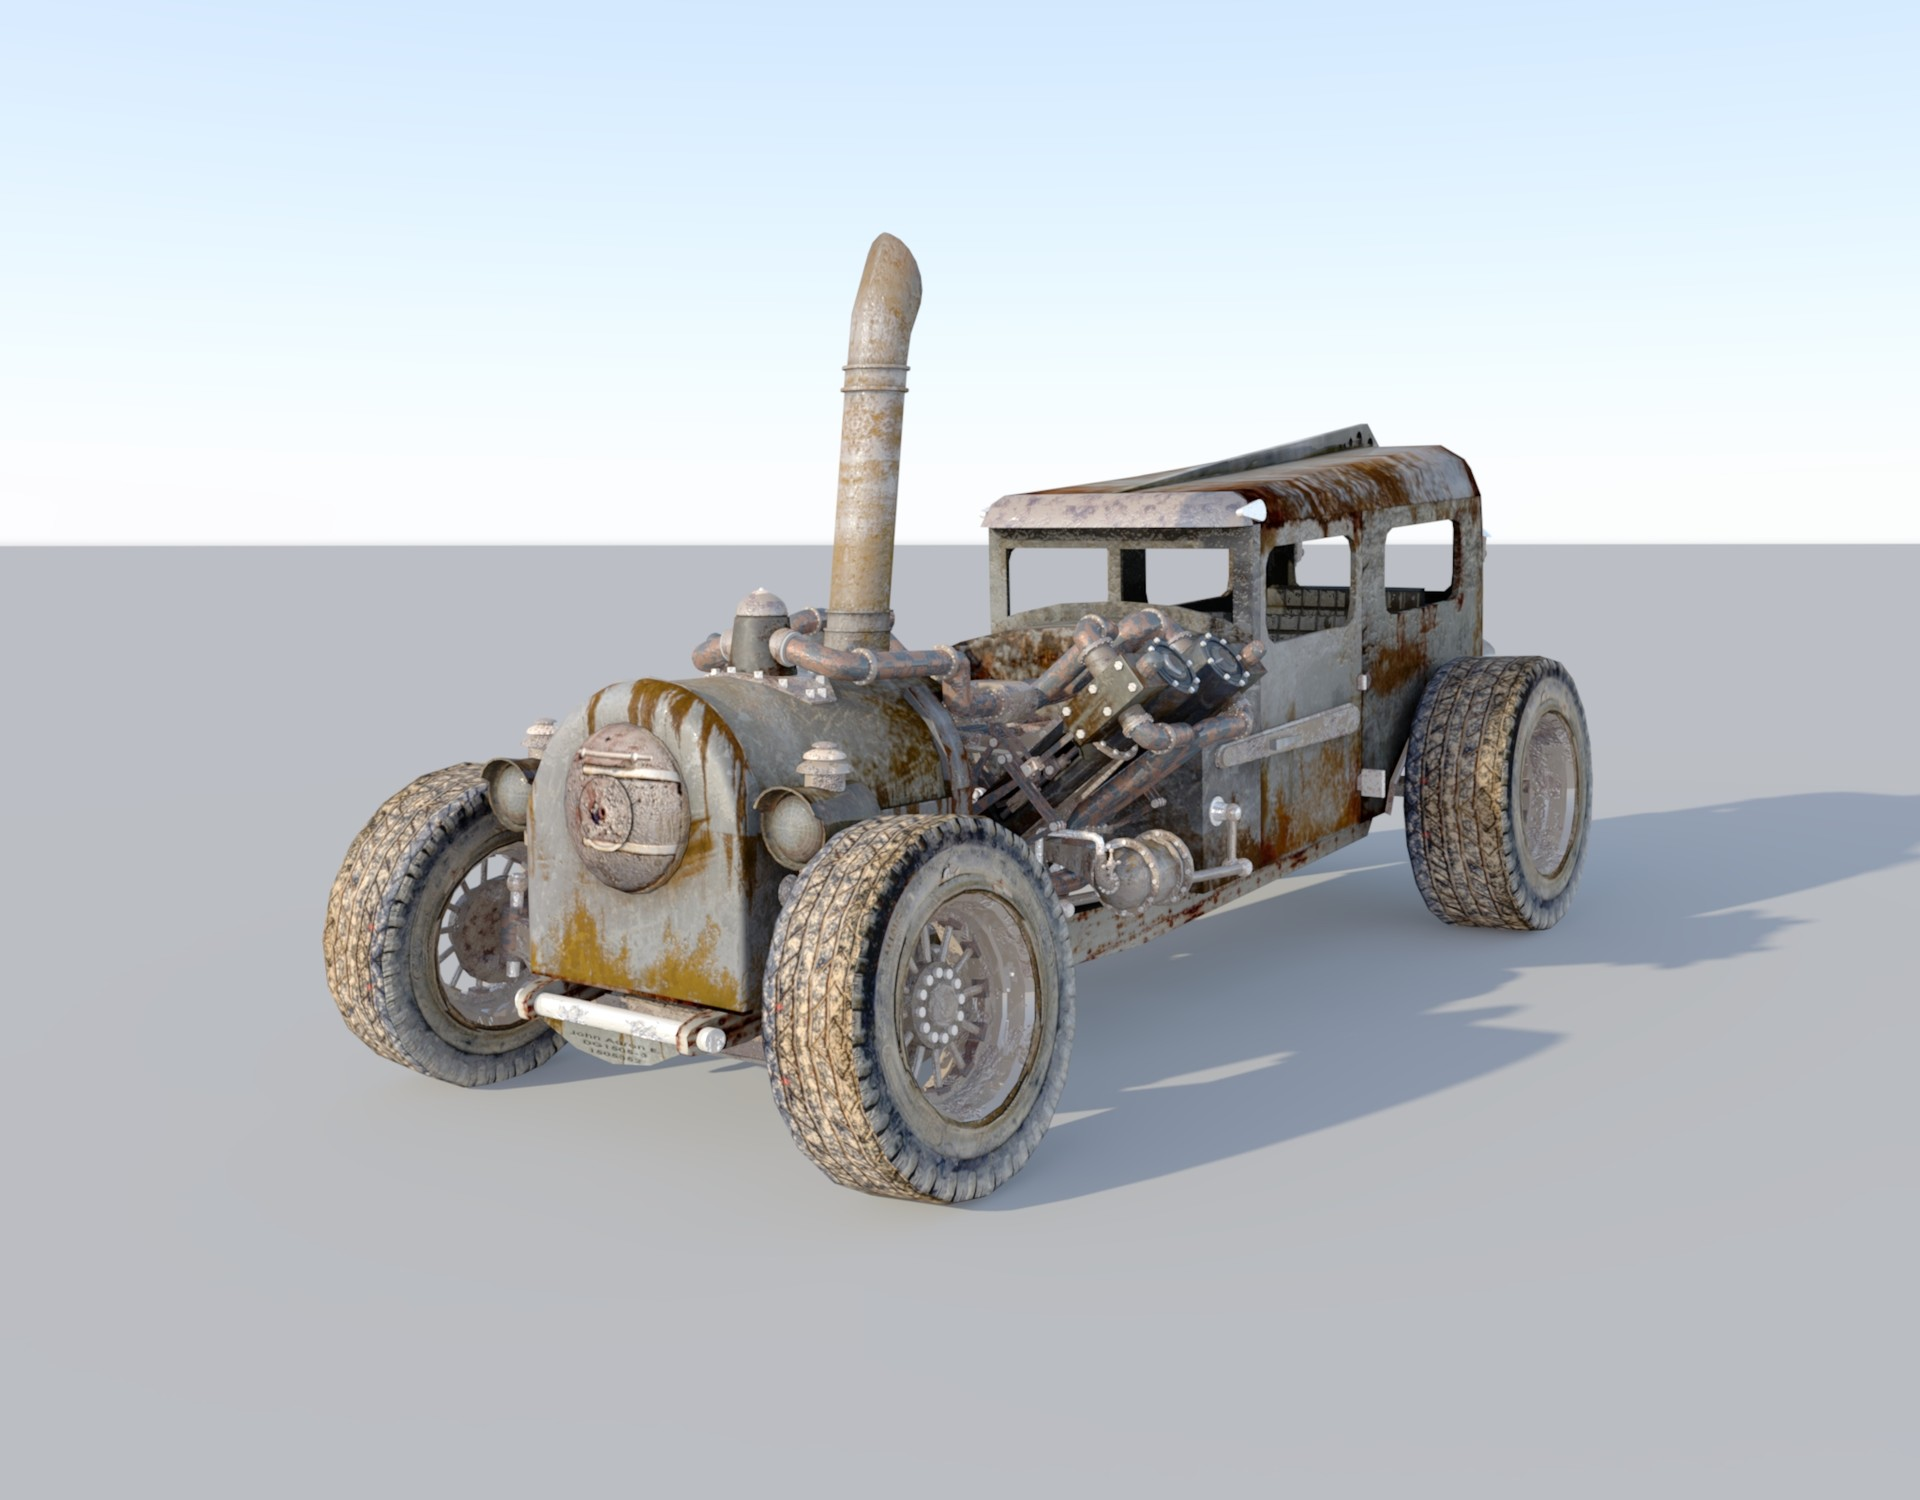 Artstation Steampunk Vehicle ȉ¯æœ— ǧ€å¾³